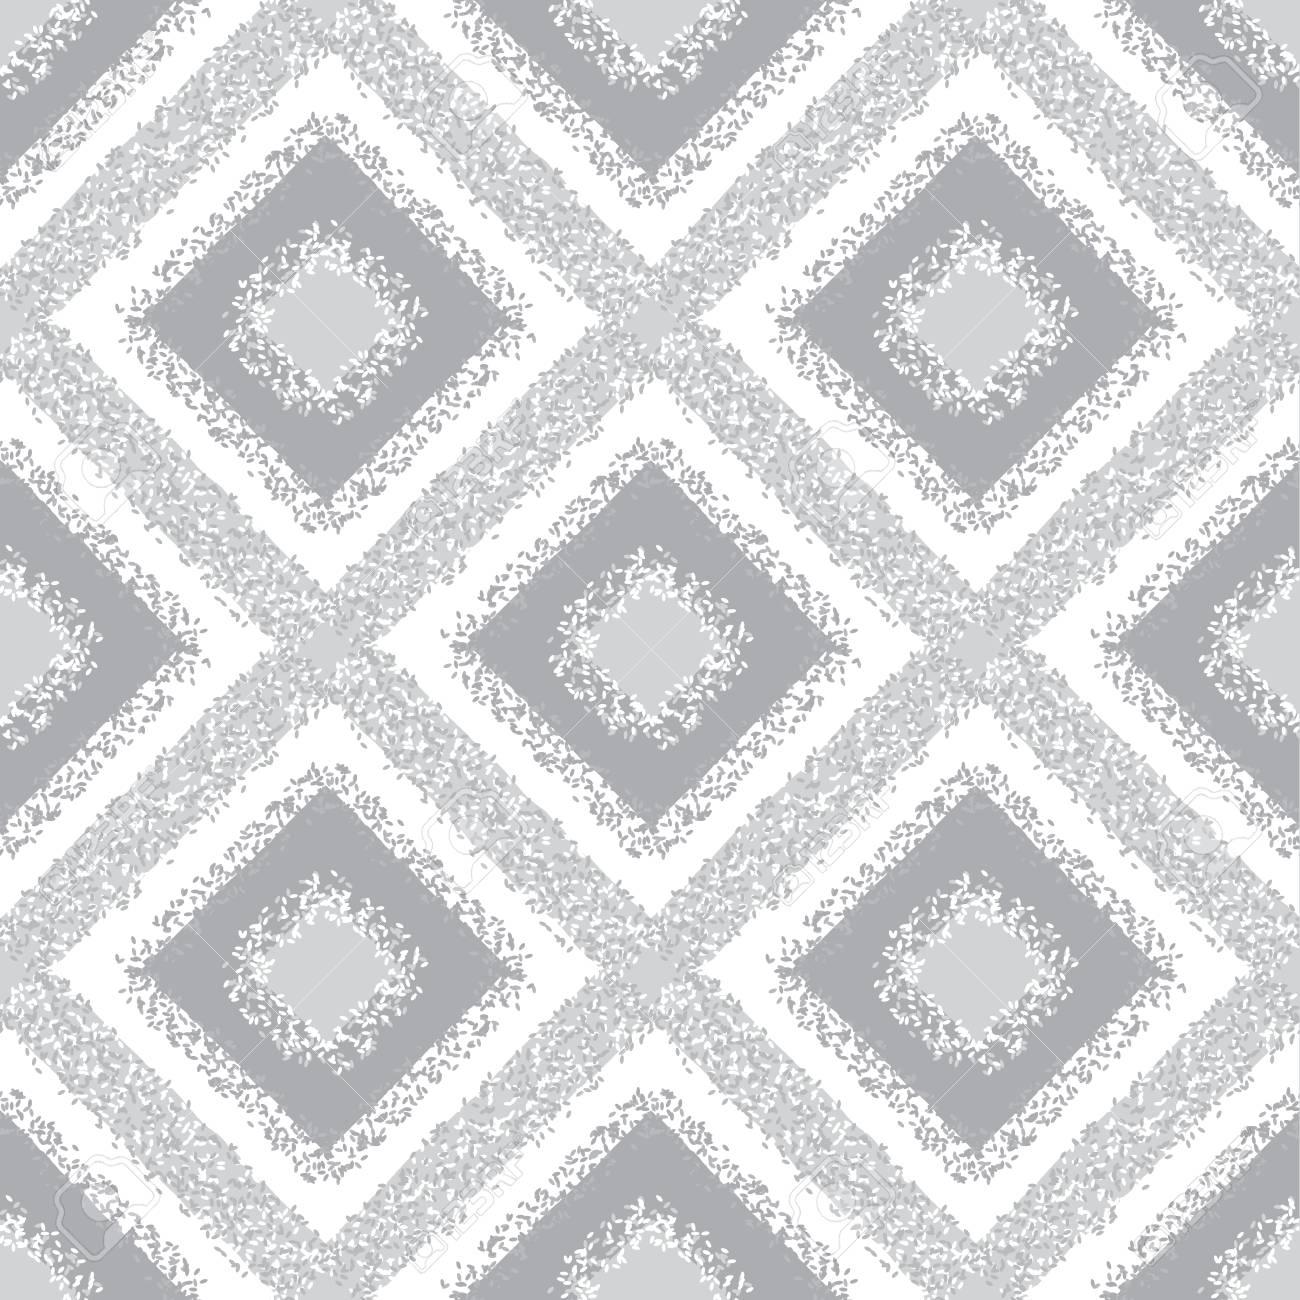 Gray Rhombus Carpet Seamless Pattern Geometric Dotted Textured